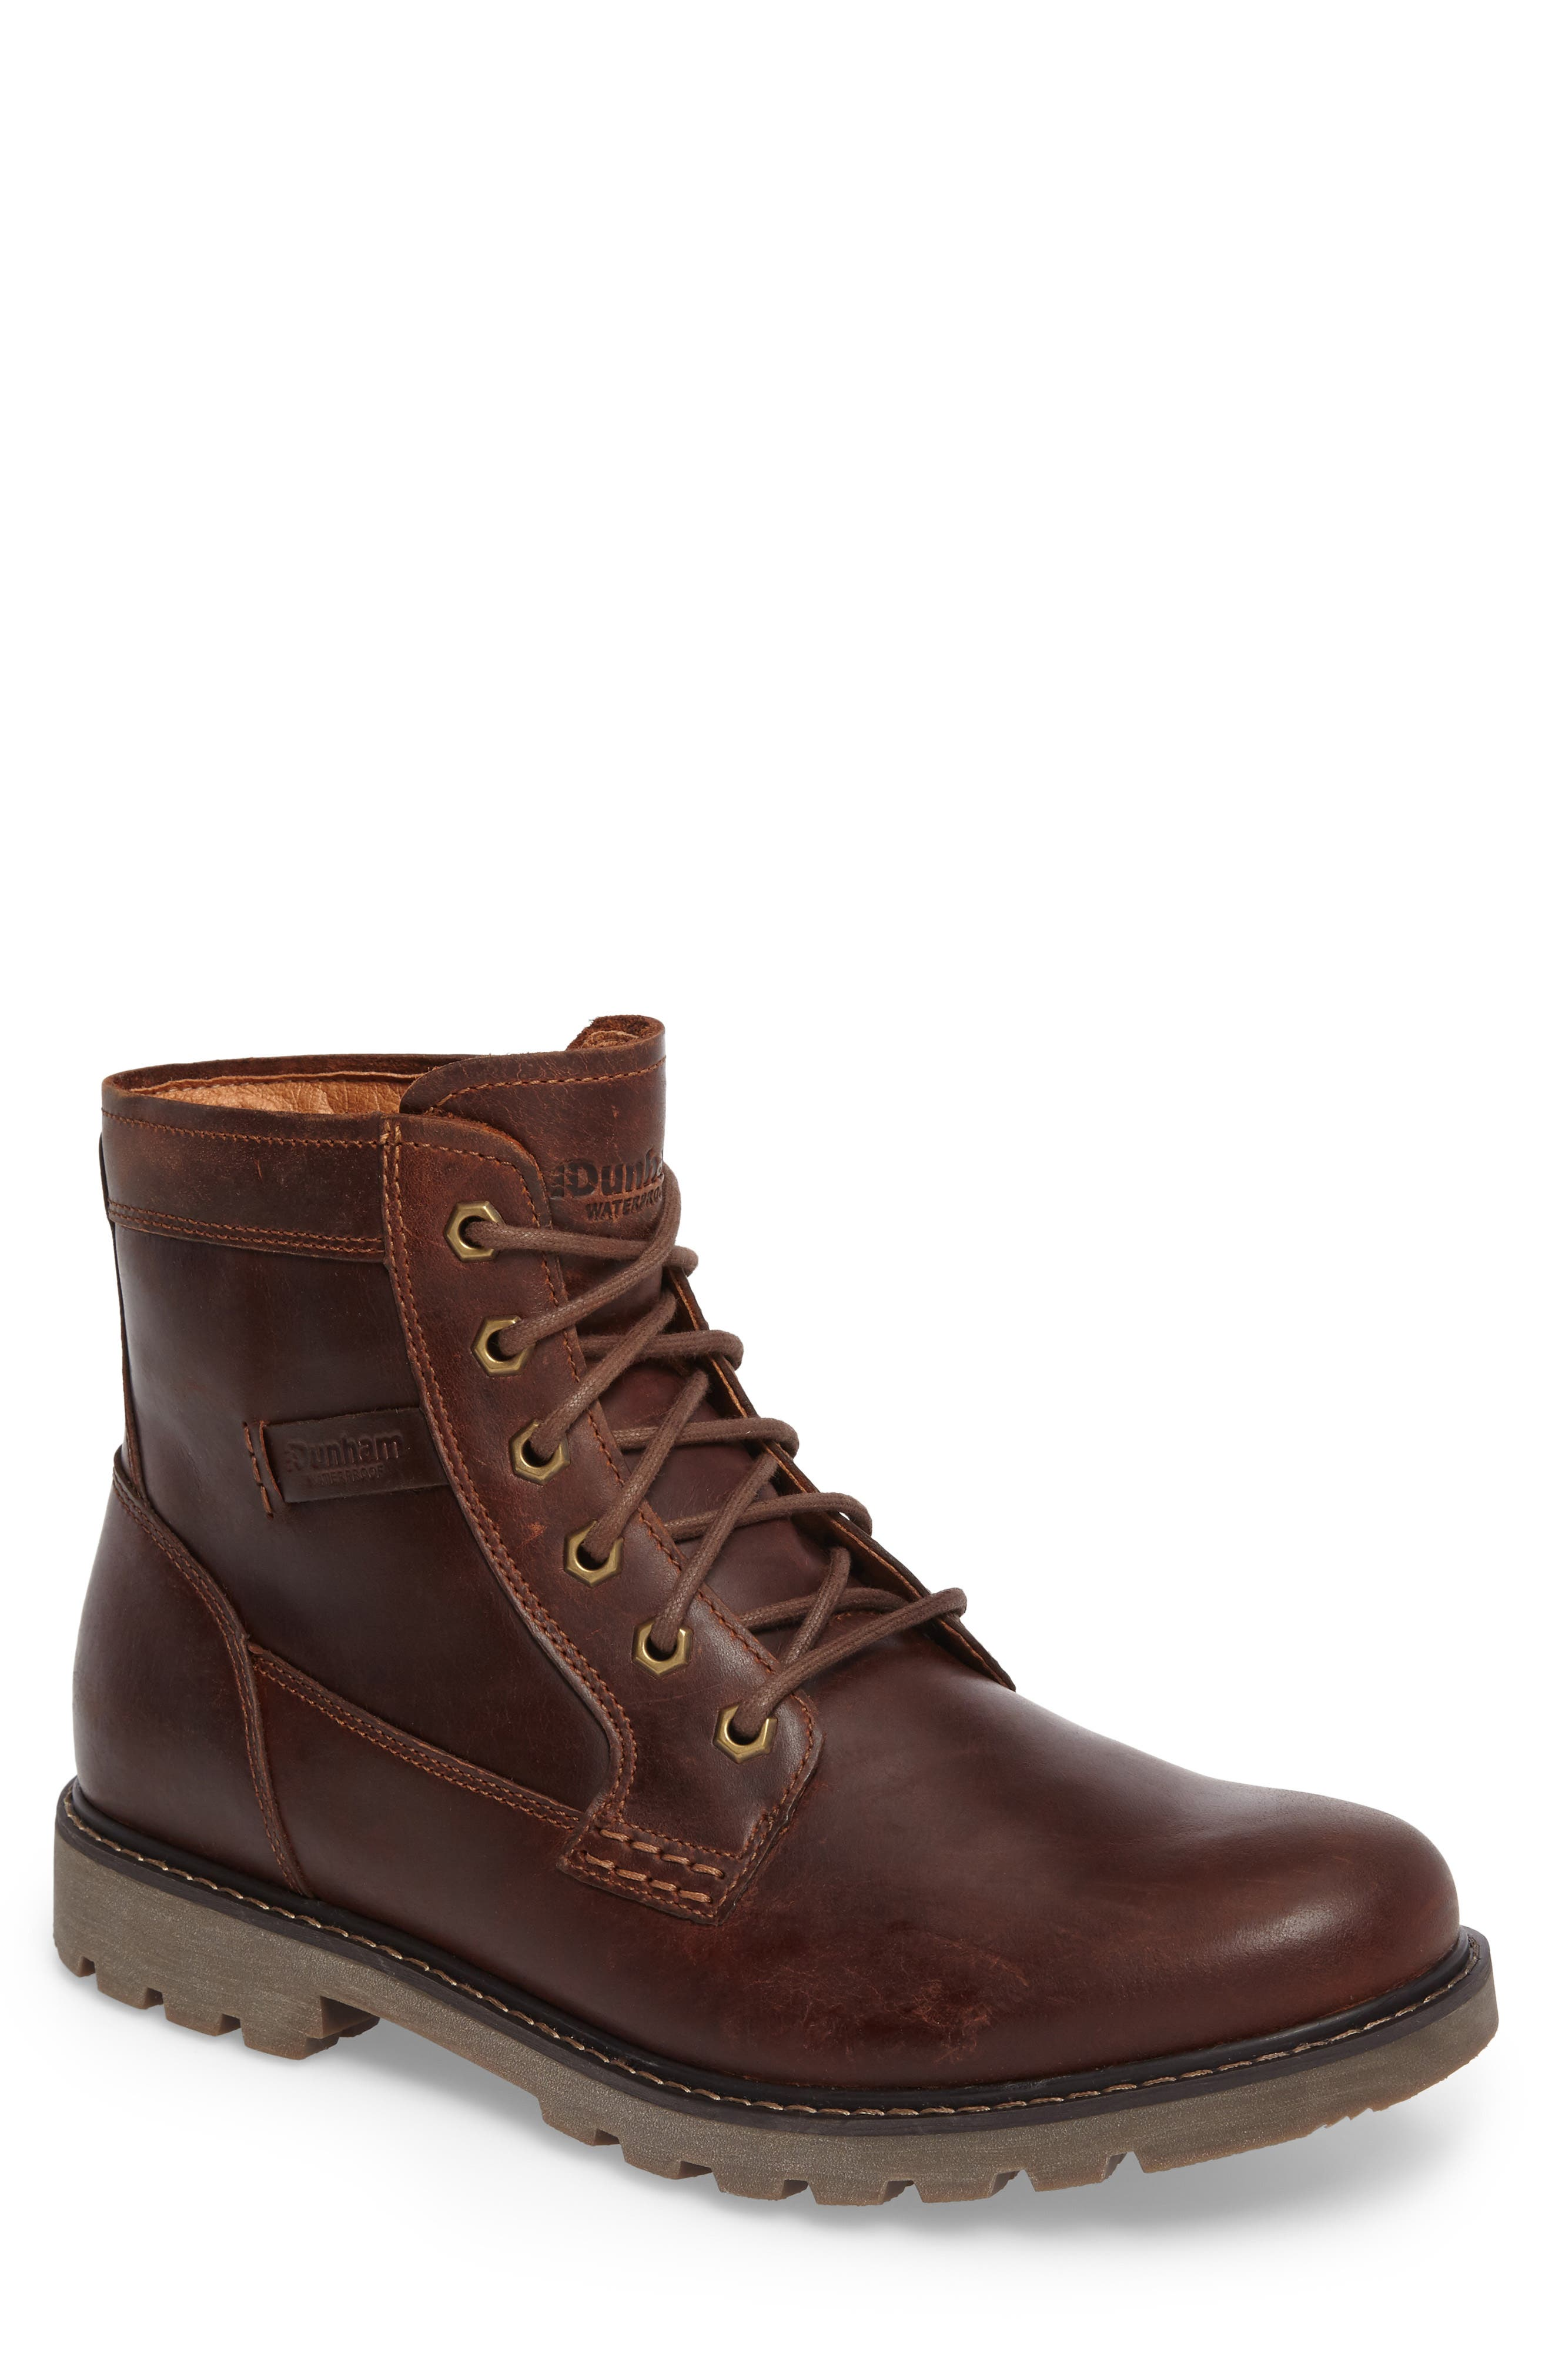 Royalton Plain Toe Boot,                             Main thumbnail 1, color,                             BROWN